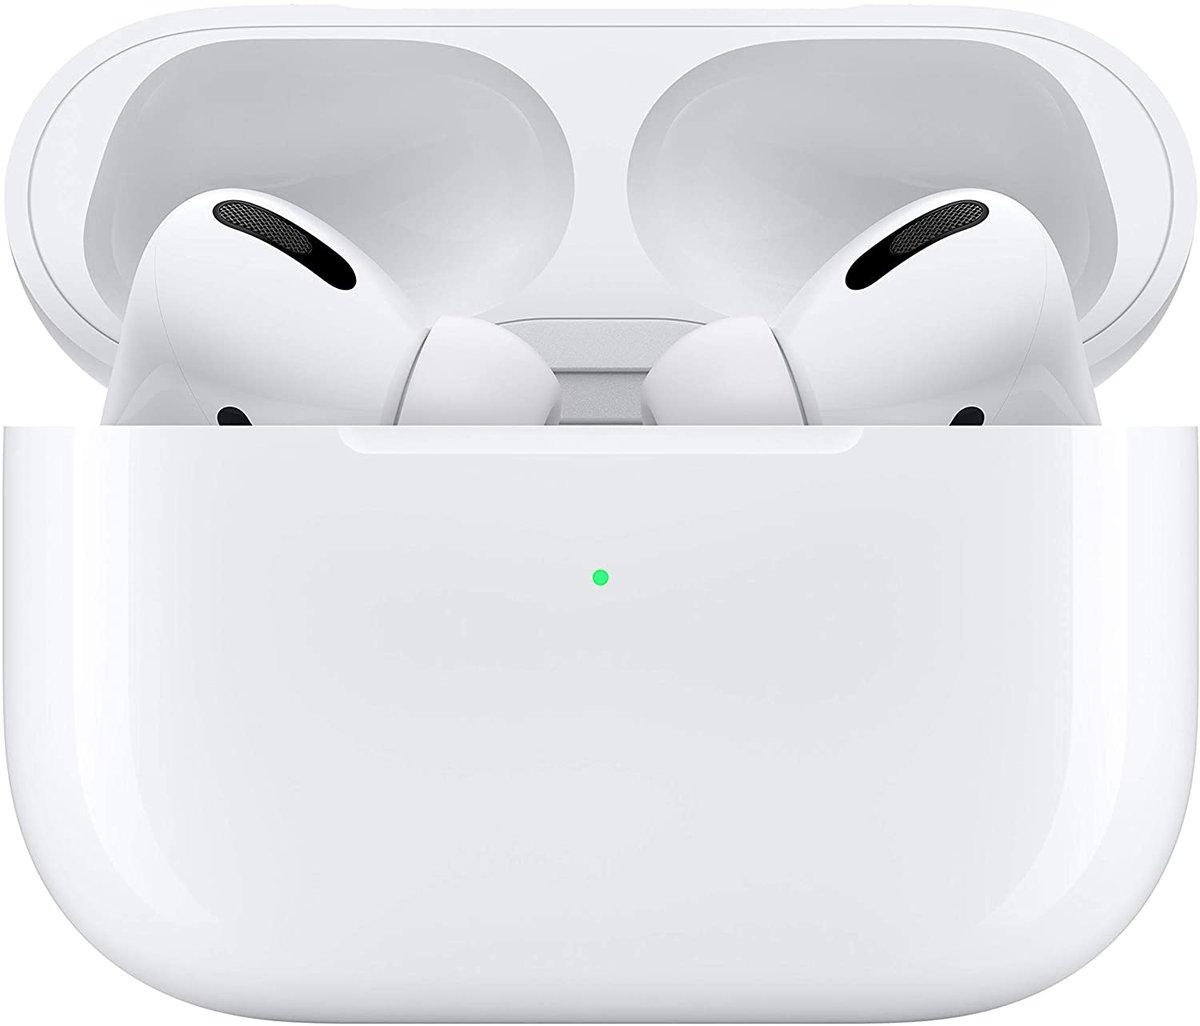 NEW Apple Airpods Pros for $219!  *Under retail, retail $250!!  https://t.co/RtTX6UXTnJ https://t.co/l6wNdYkOYq